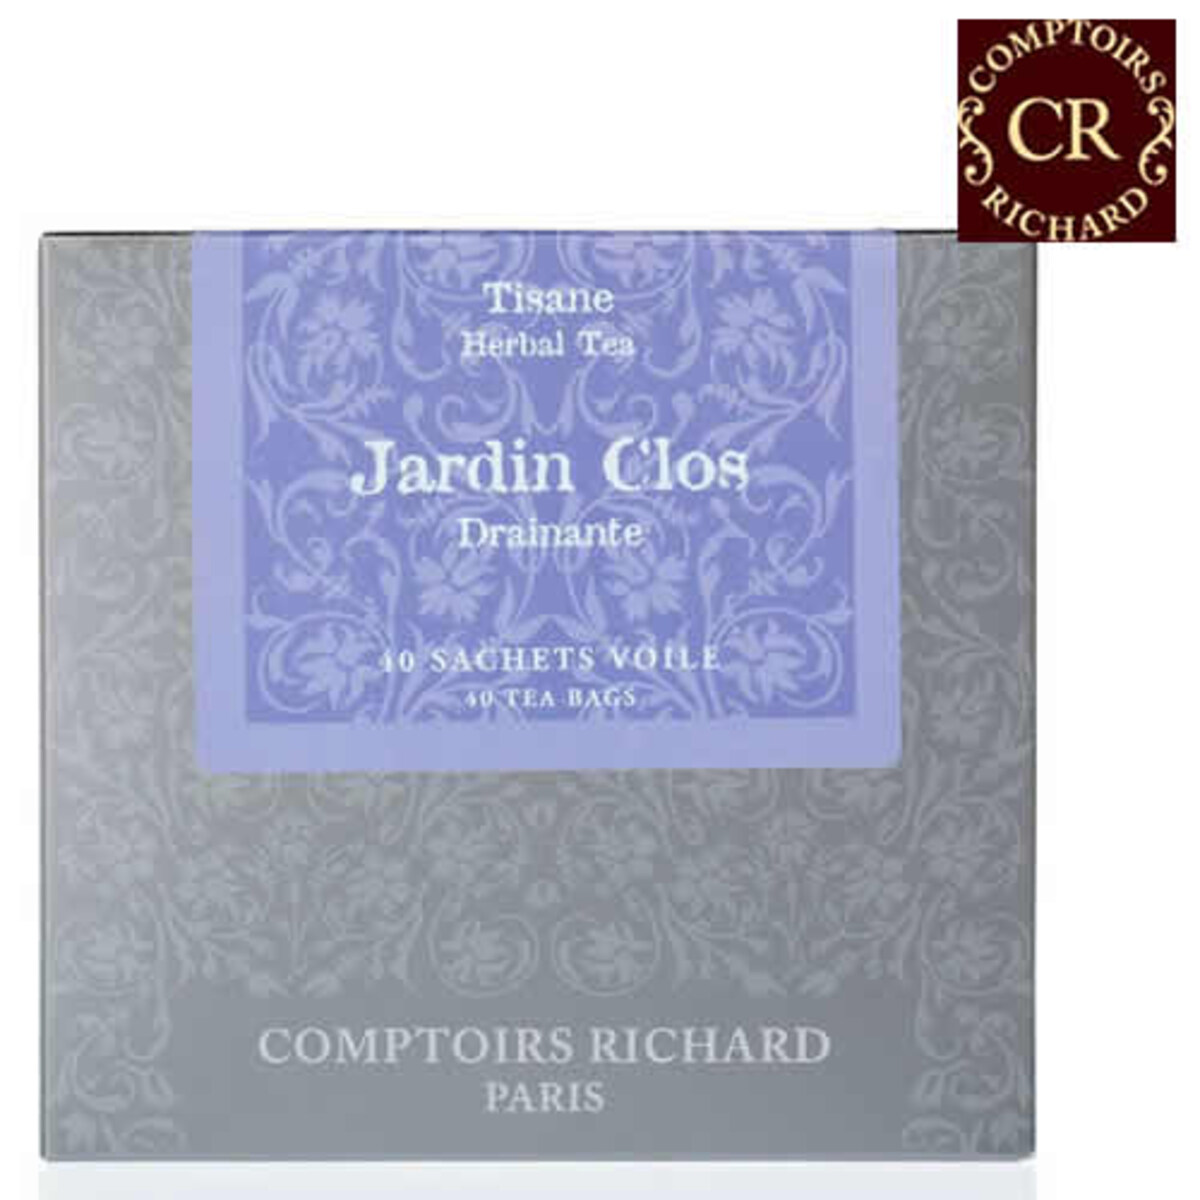 Comptoirs Richard Jardin Clos Drainante - 40бр сашета билков чай Забранената градина